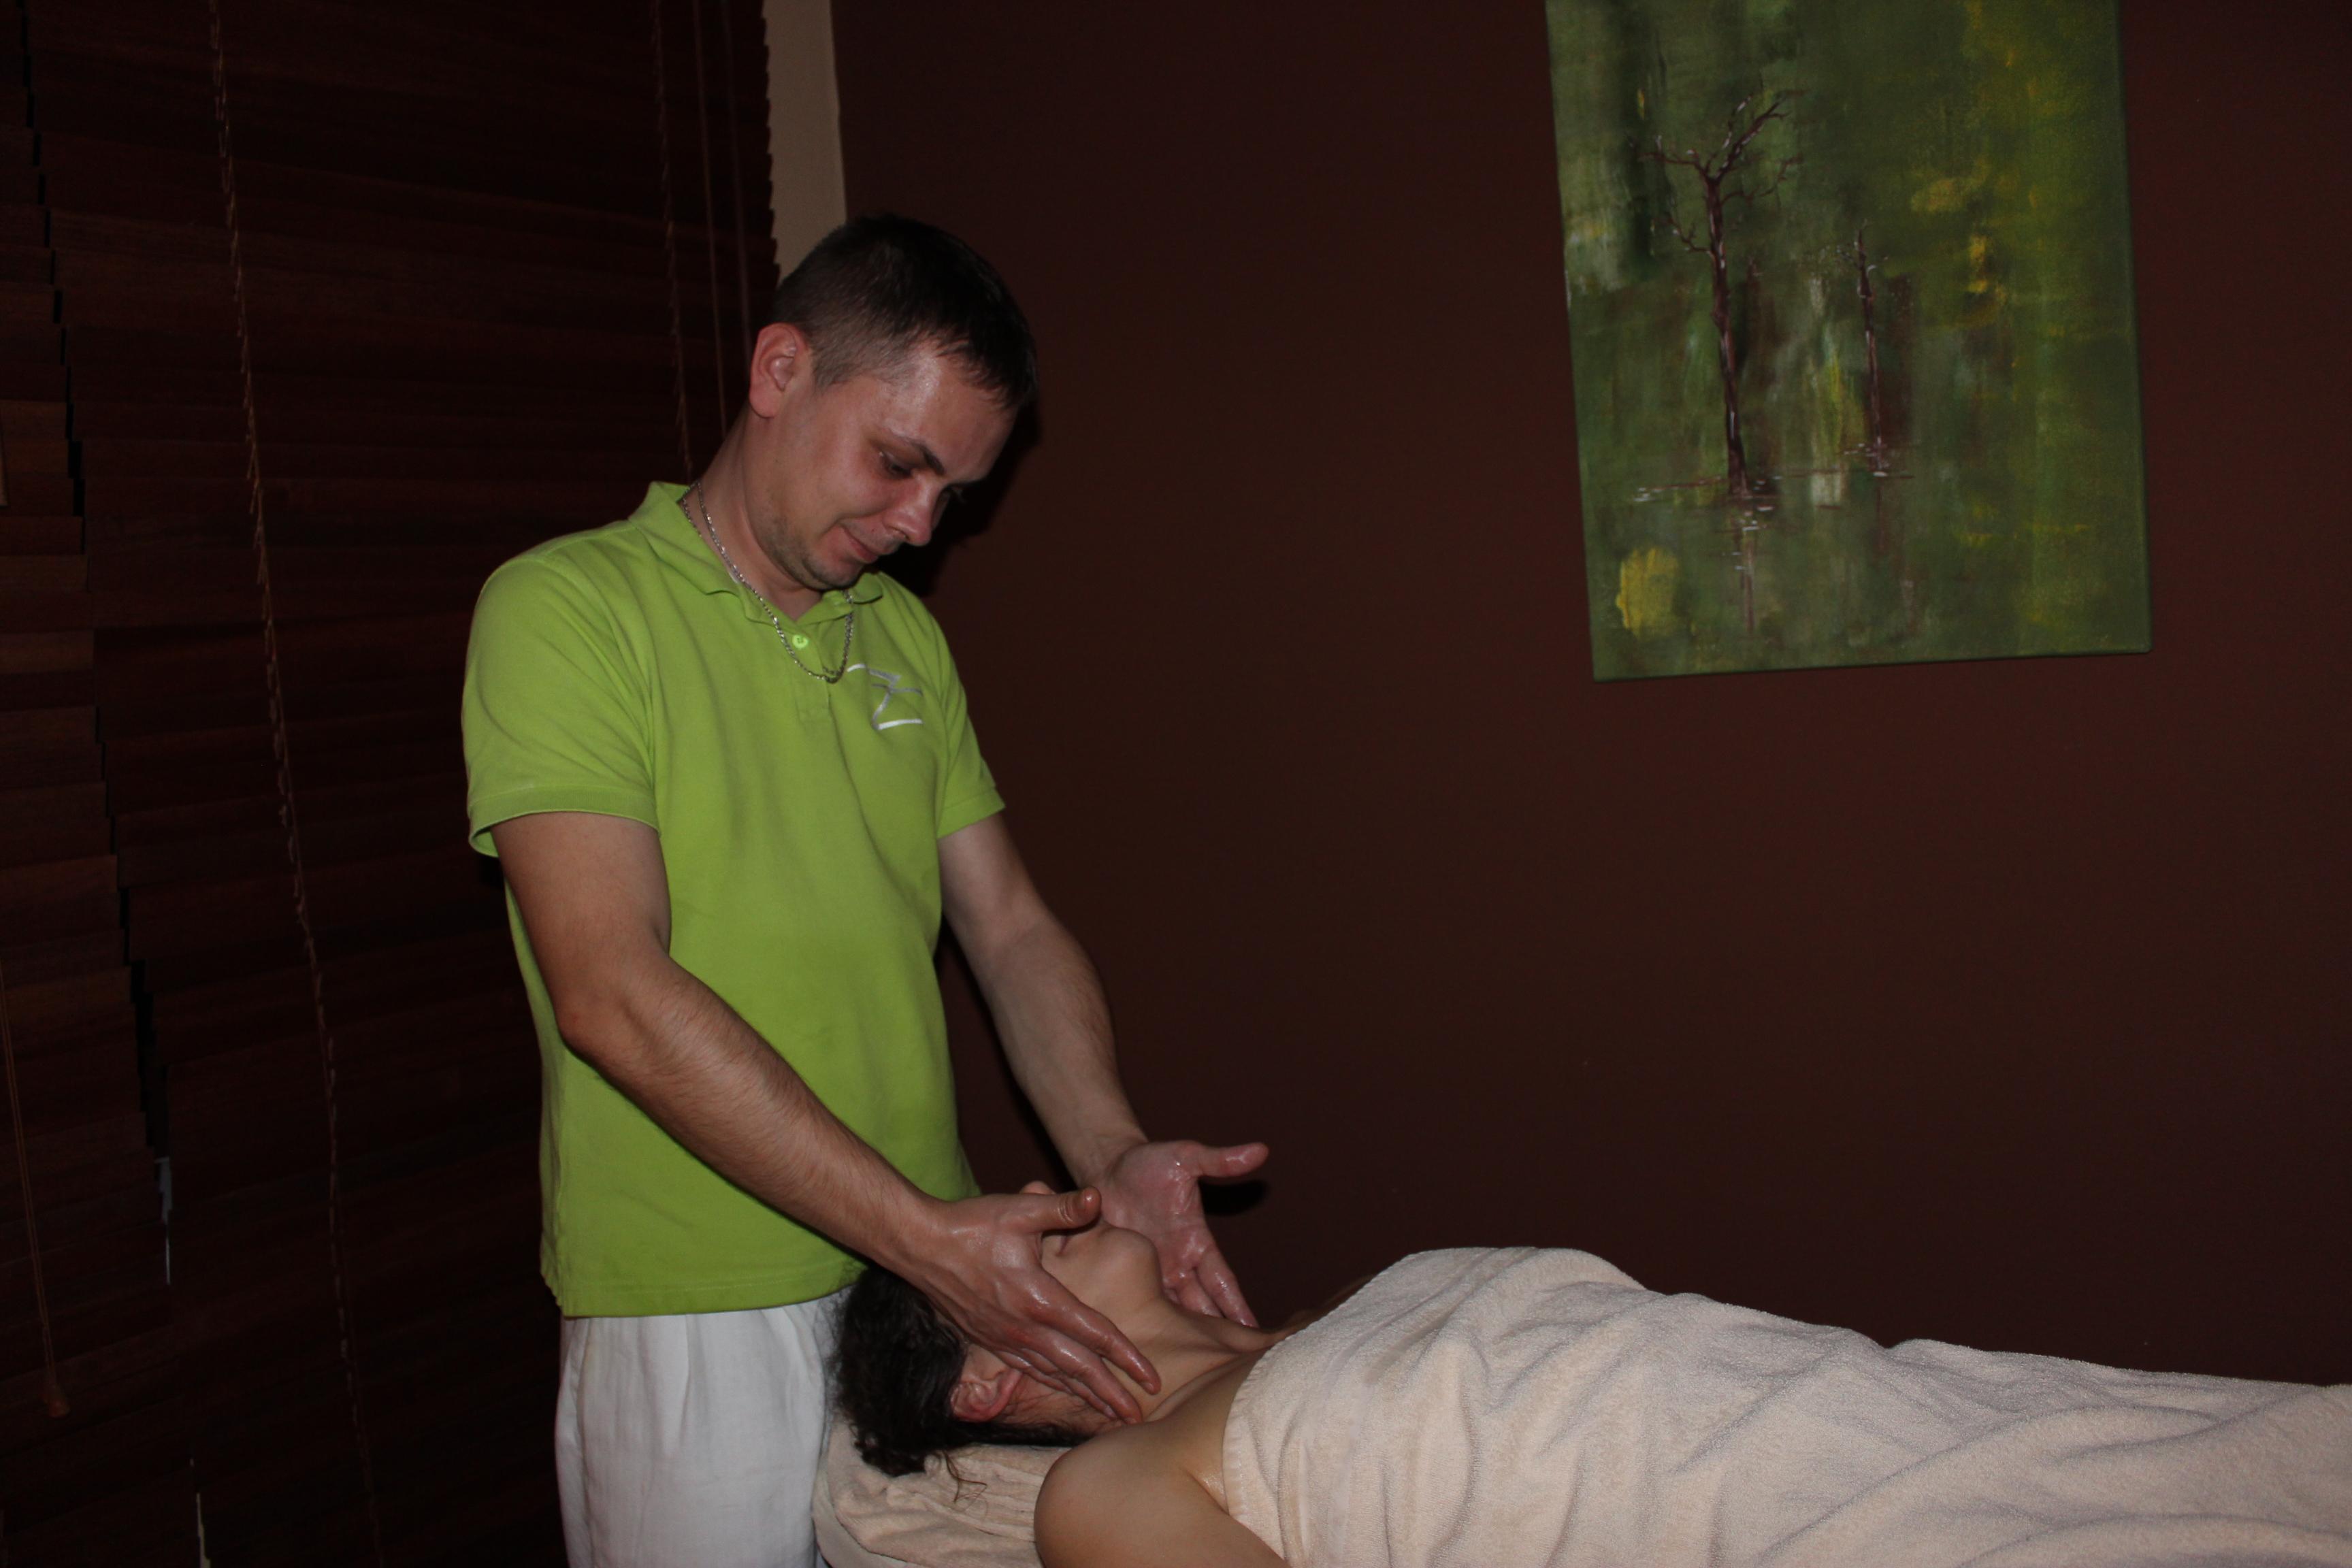 Hotel Zochova Chata - párová vínna terapia - masáž